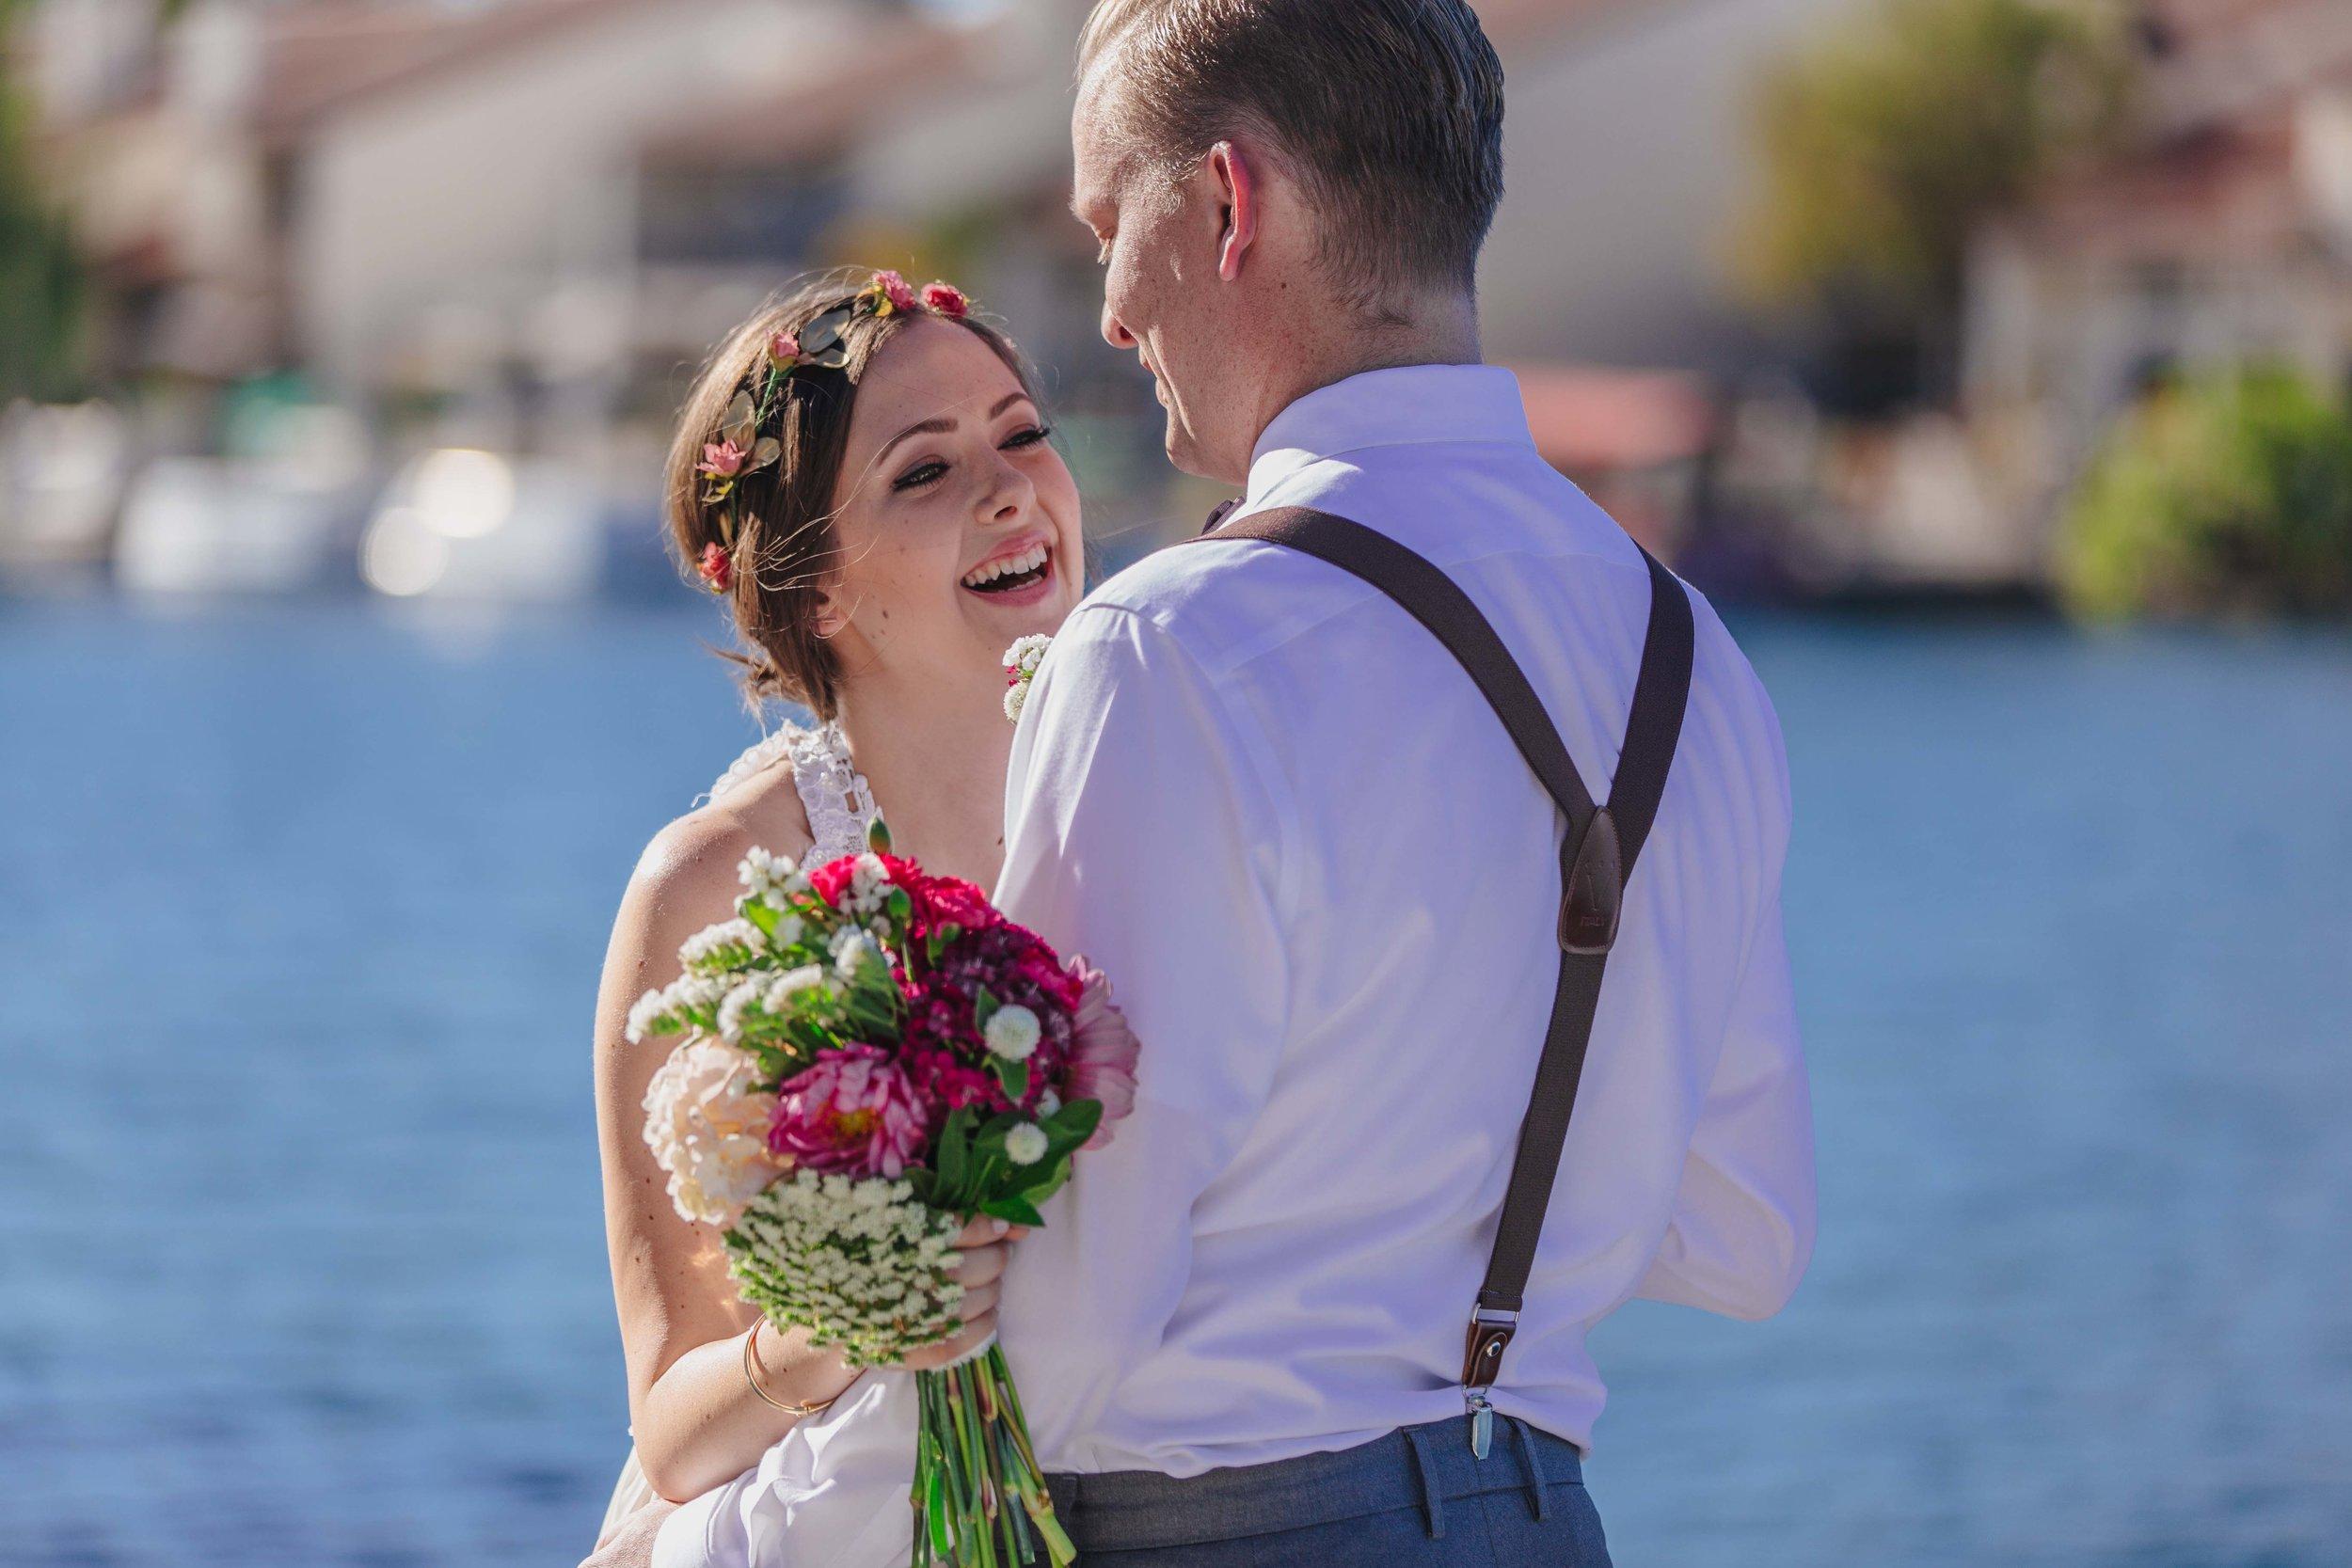 20141024-DePartee-Wedding-APavone-026-sm.jpg